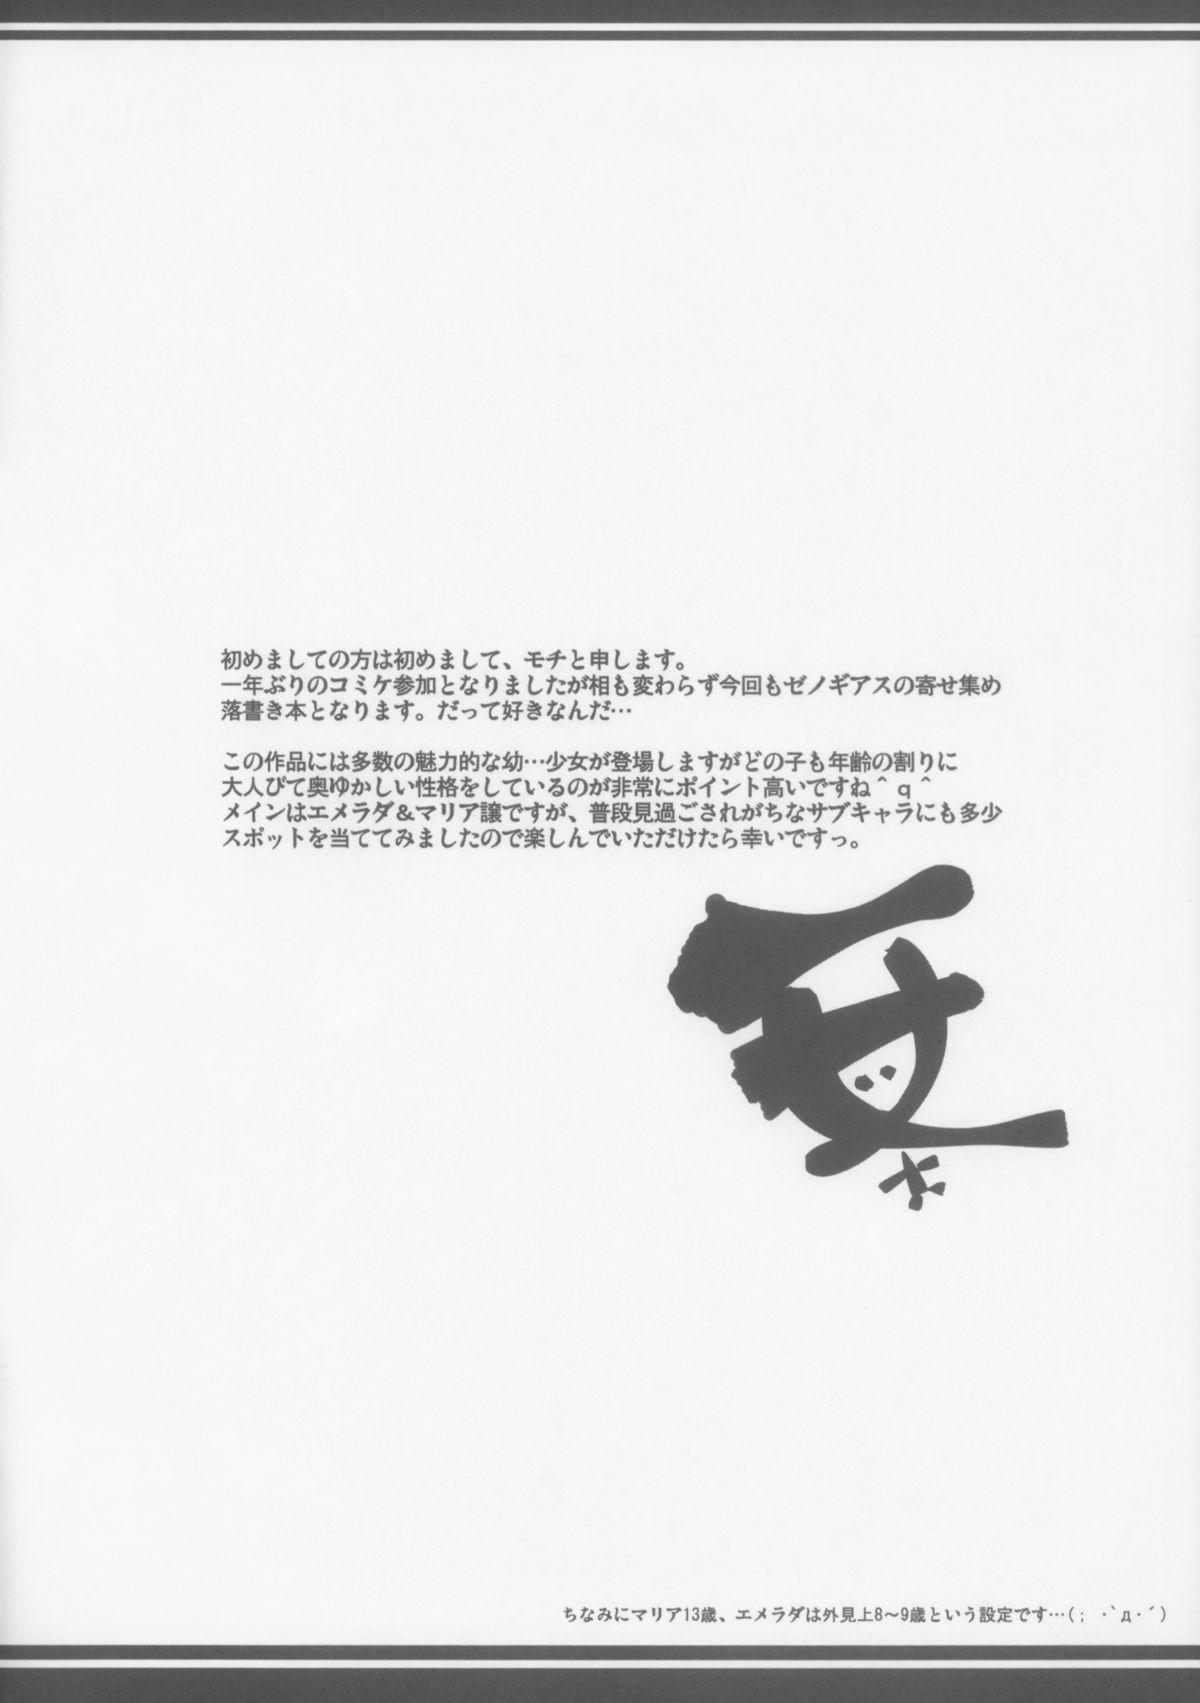 Xenogears no Eroi Rakugaki Hon part3 2